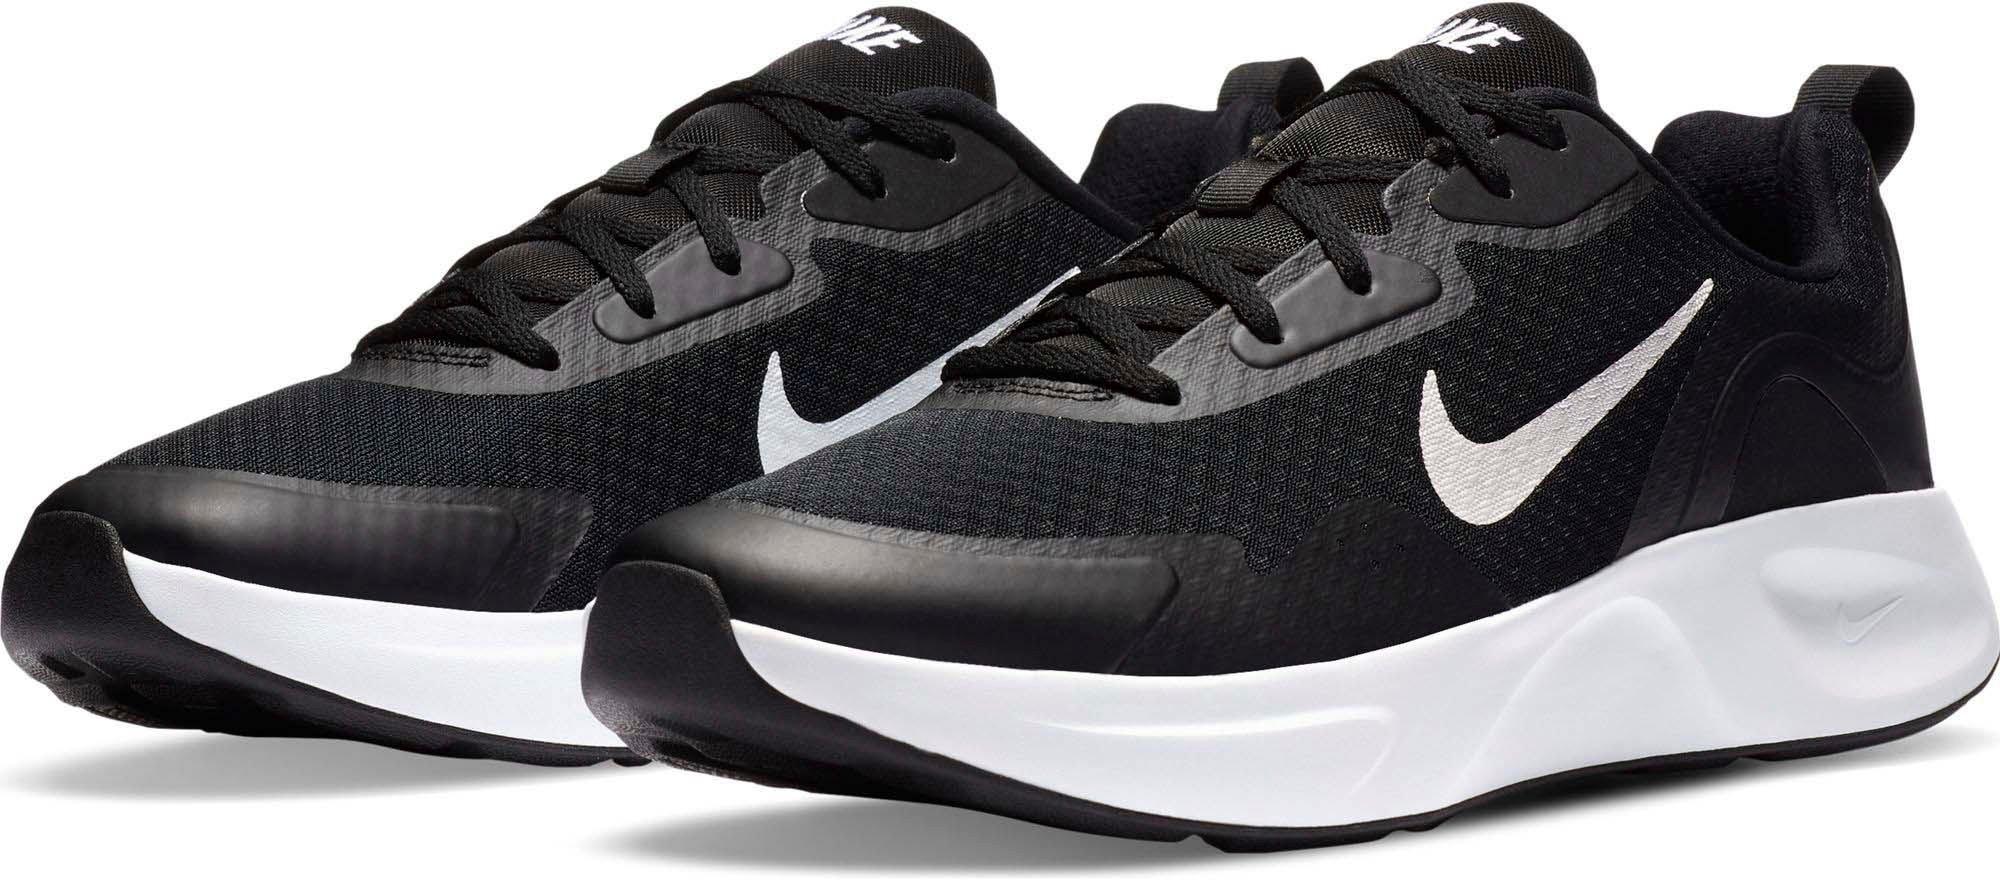 Nike Sportswear sneakers WEARALLDAY voordelig en veilig online kopen